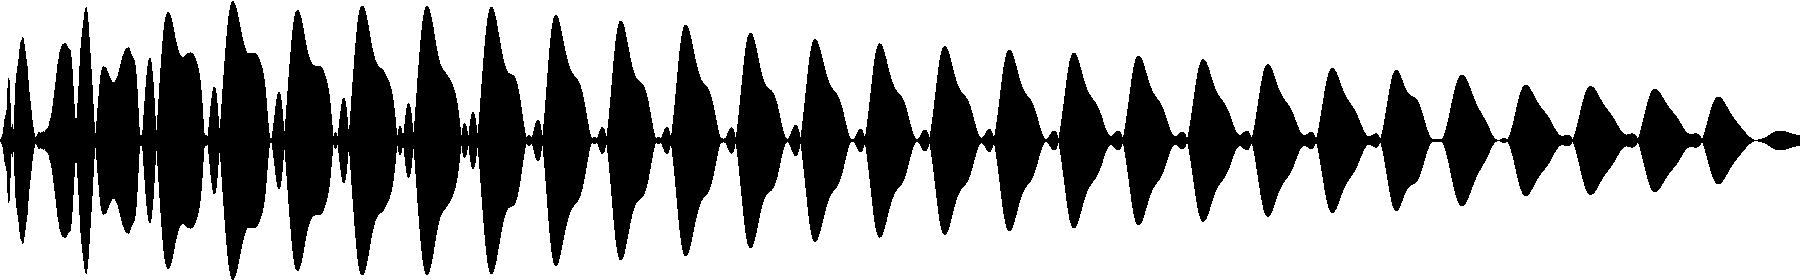 vedh bass cut 073 g